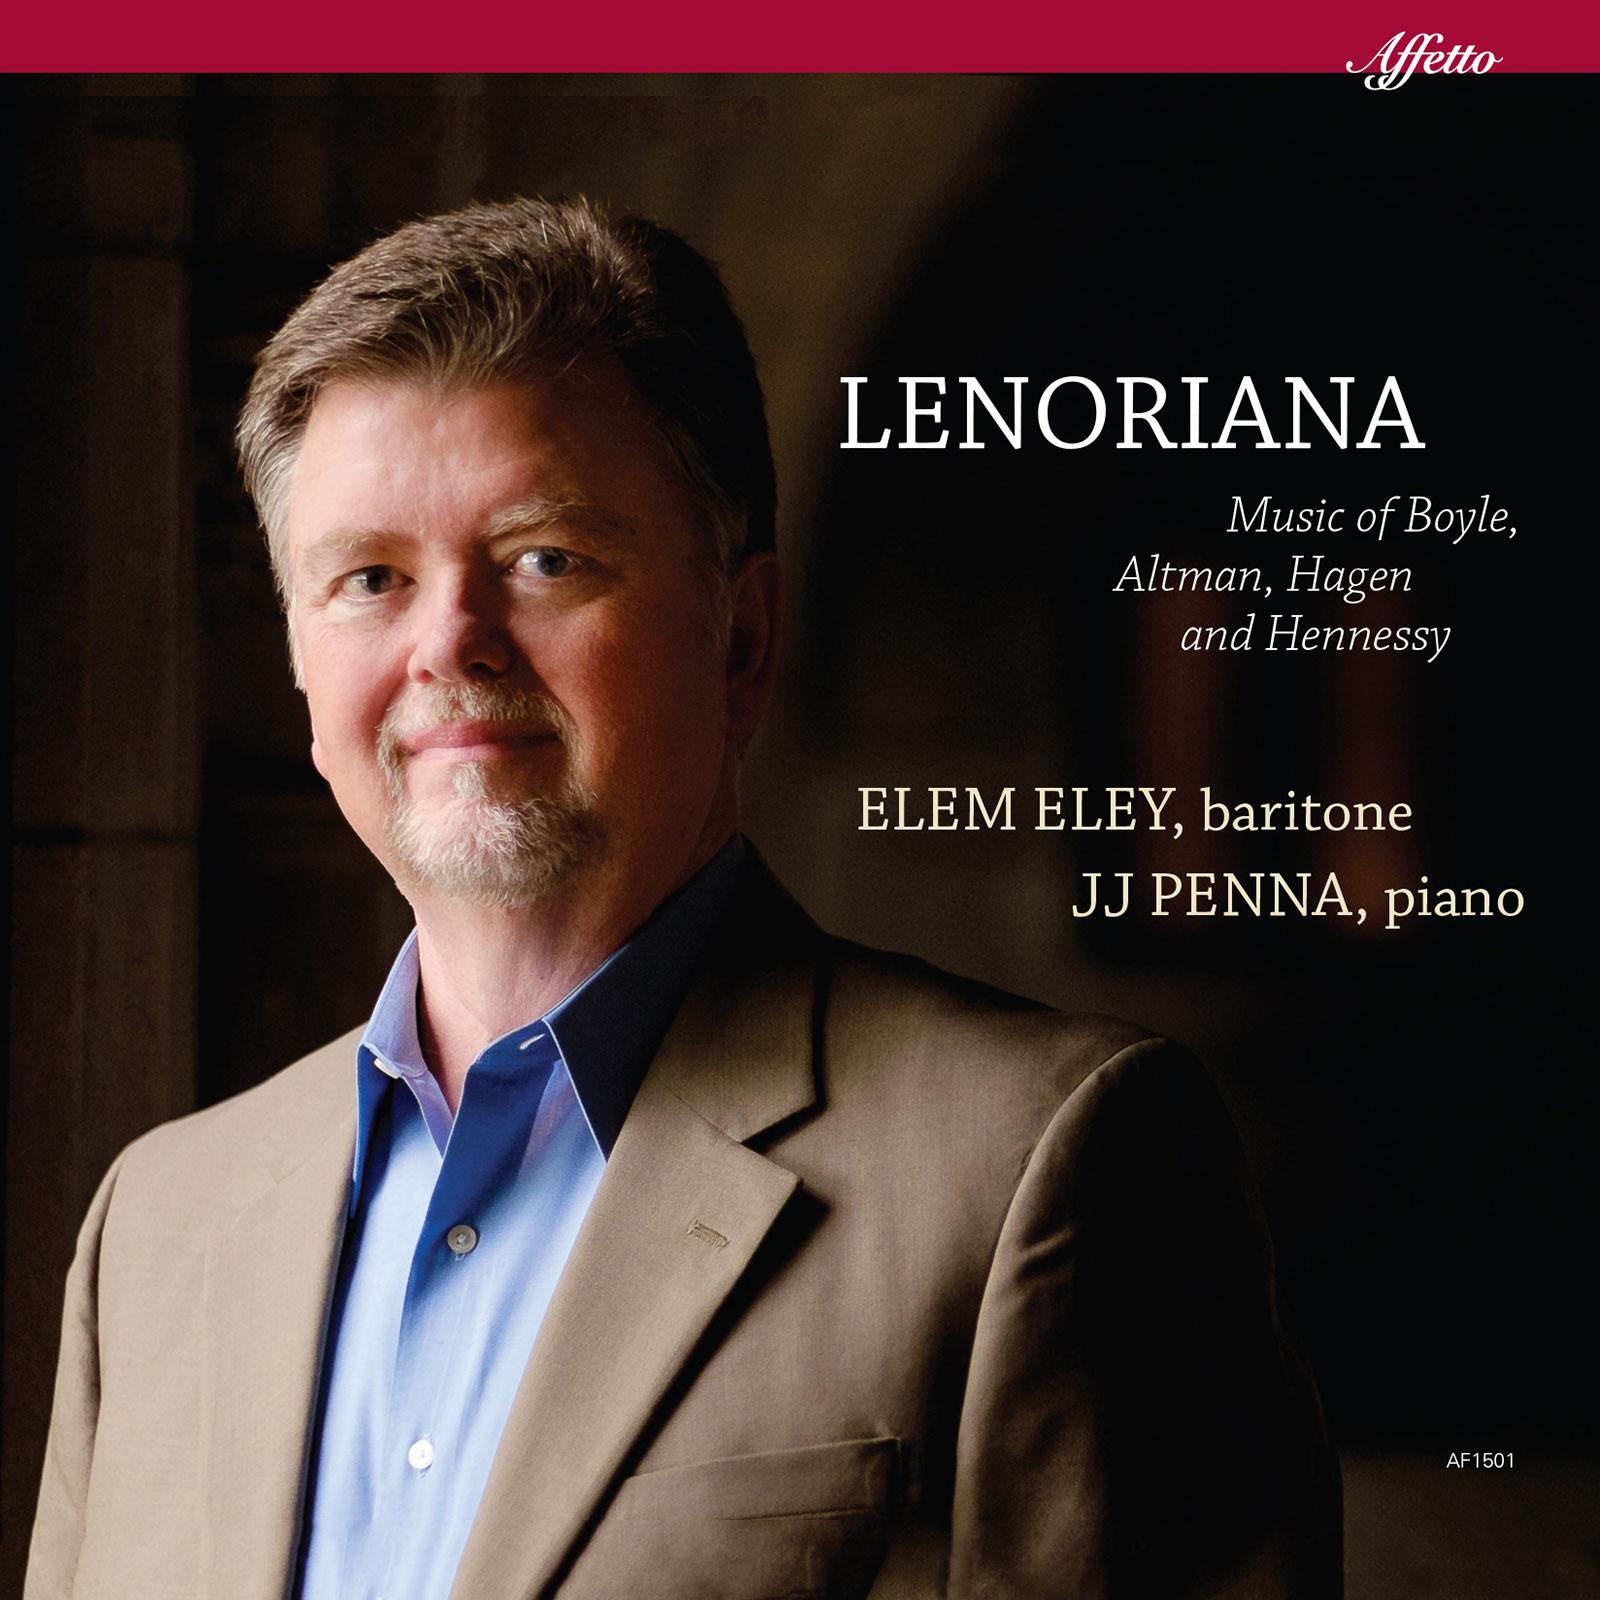 Lenoriana – Music of Boyle, Altman, Hagen and Hennessy